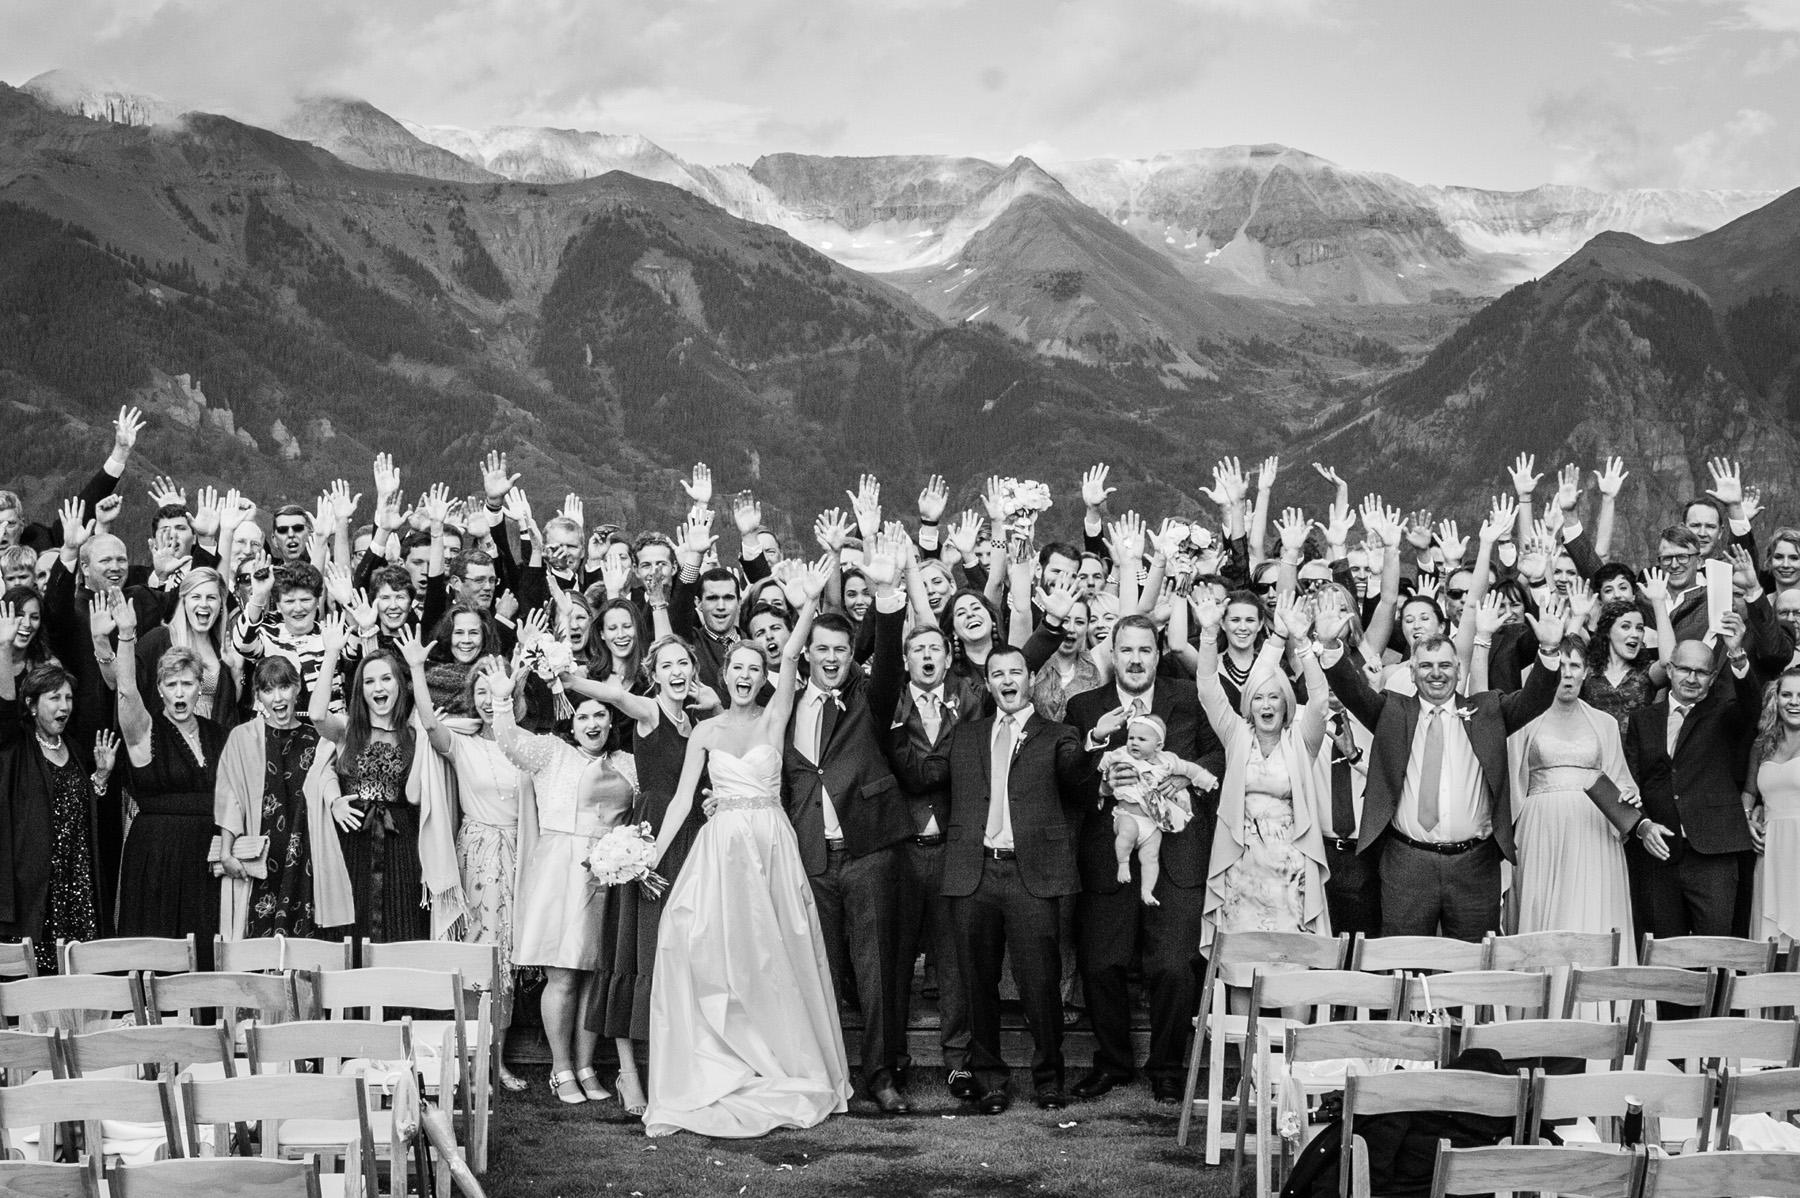 large group photo at San Sophia Overlook in Telluride Colorado